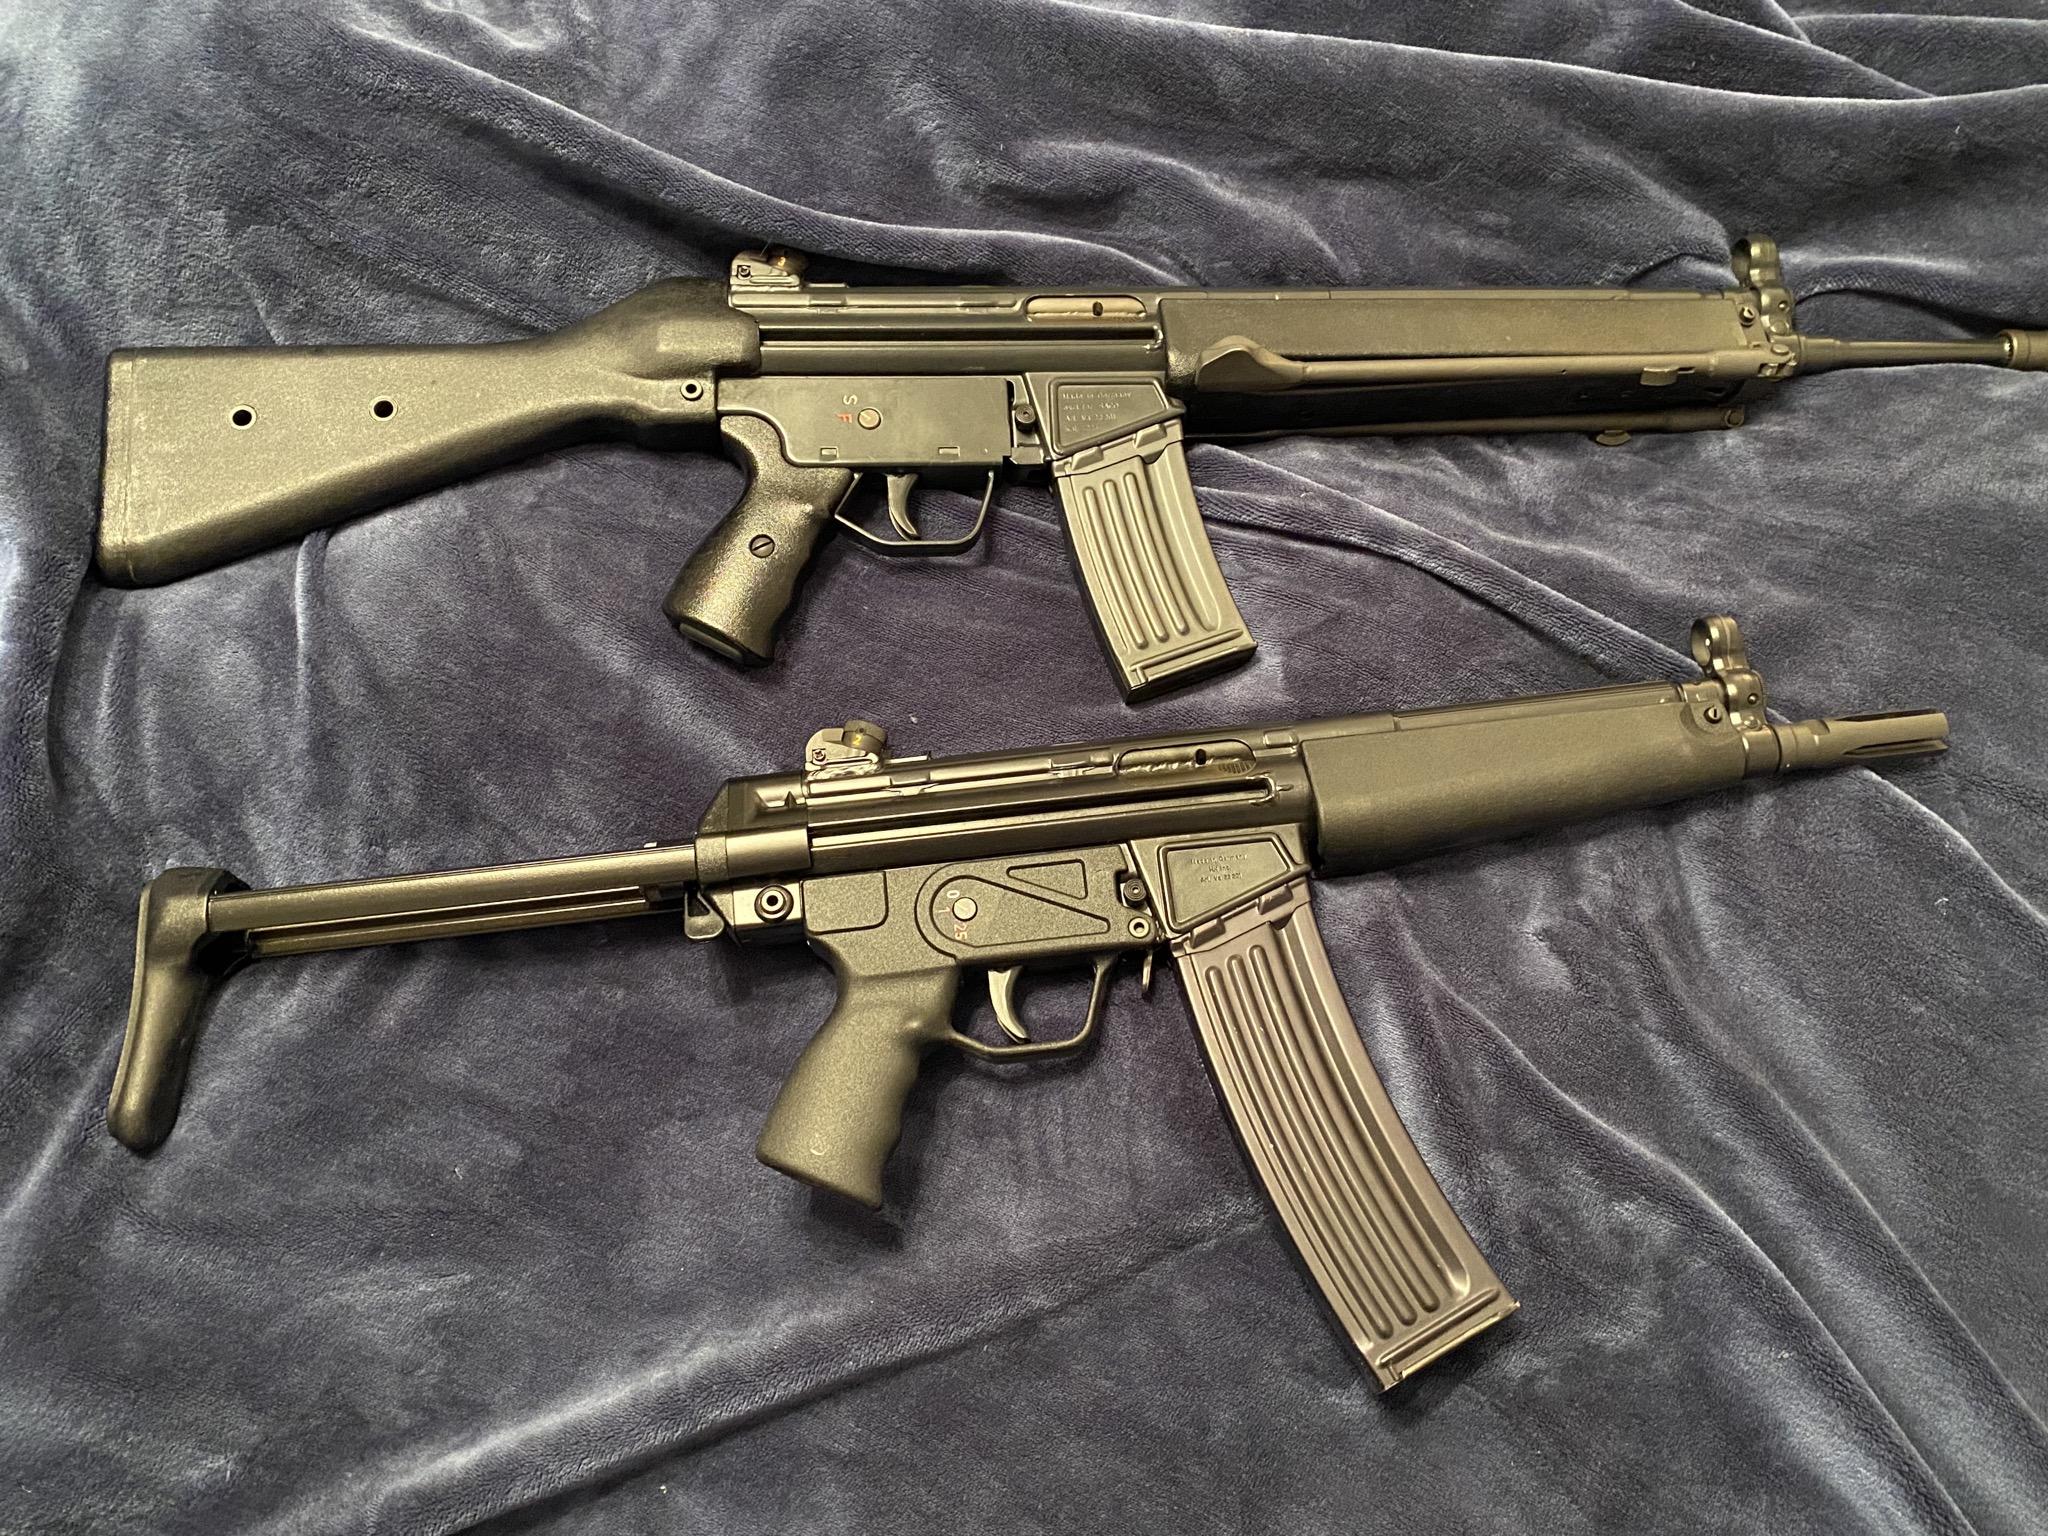 HK93 popularity or lack there of.....-4187b36e-8777-4de2-a801-ed77009327df_1583290094696.jpeg